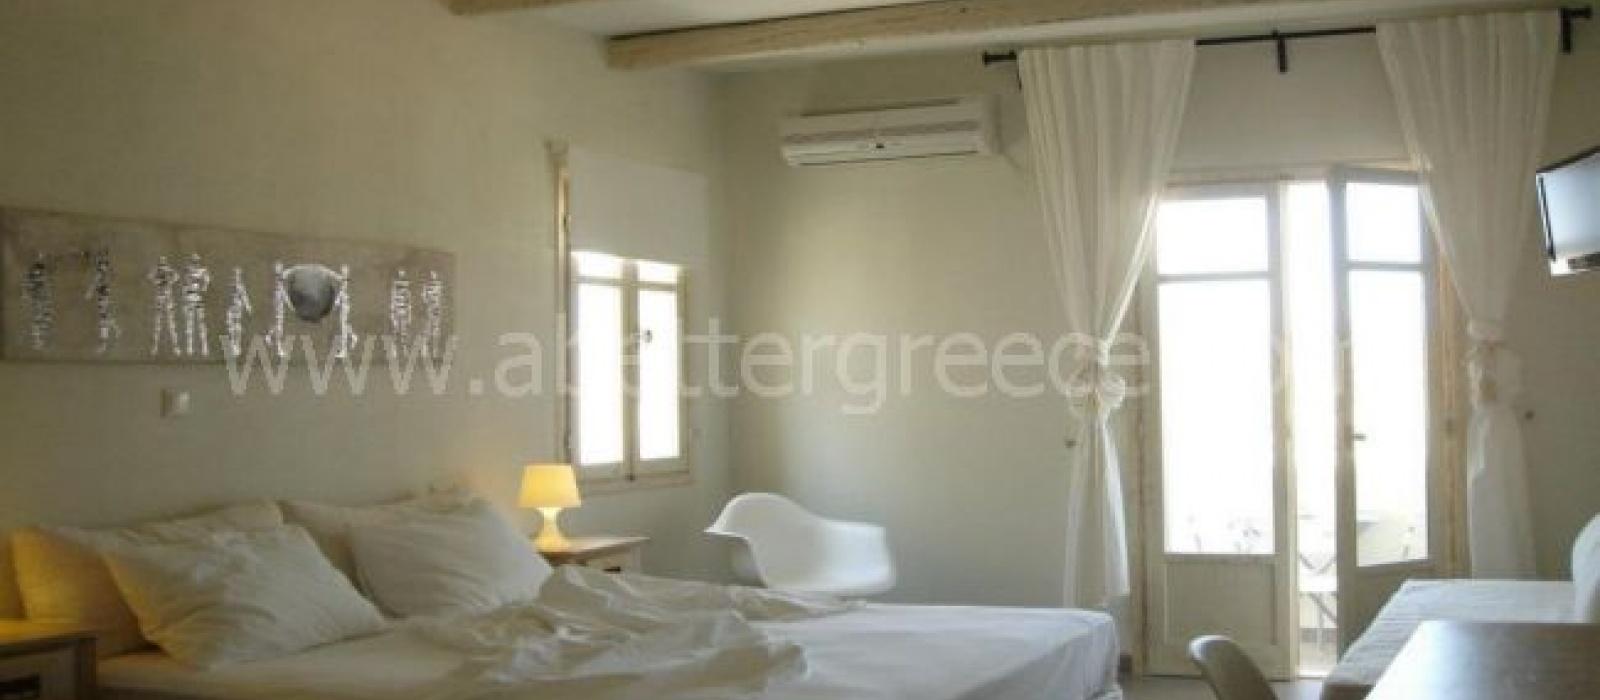 1 Bedrooms, Apartment, Vacation Rental, 1 Bathrooms, Listing ID 1169, Iraklia, Greece,